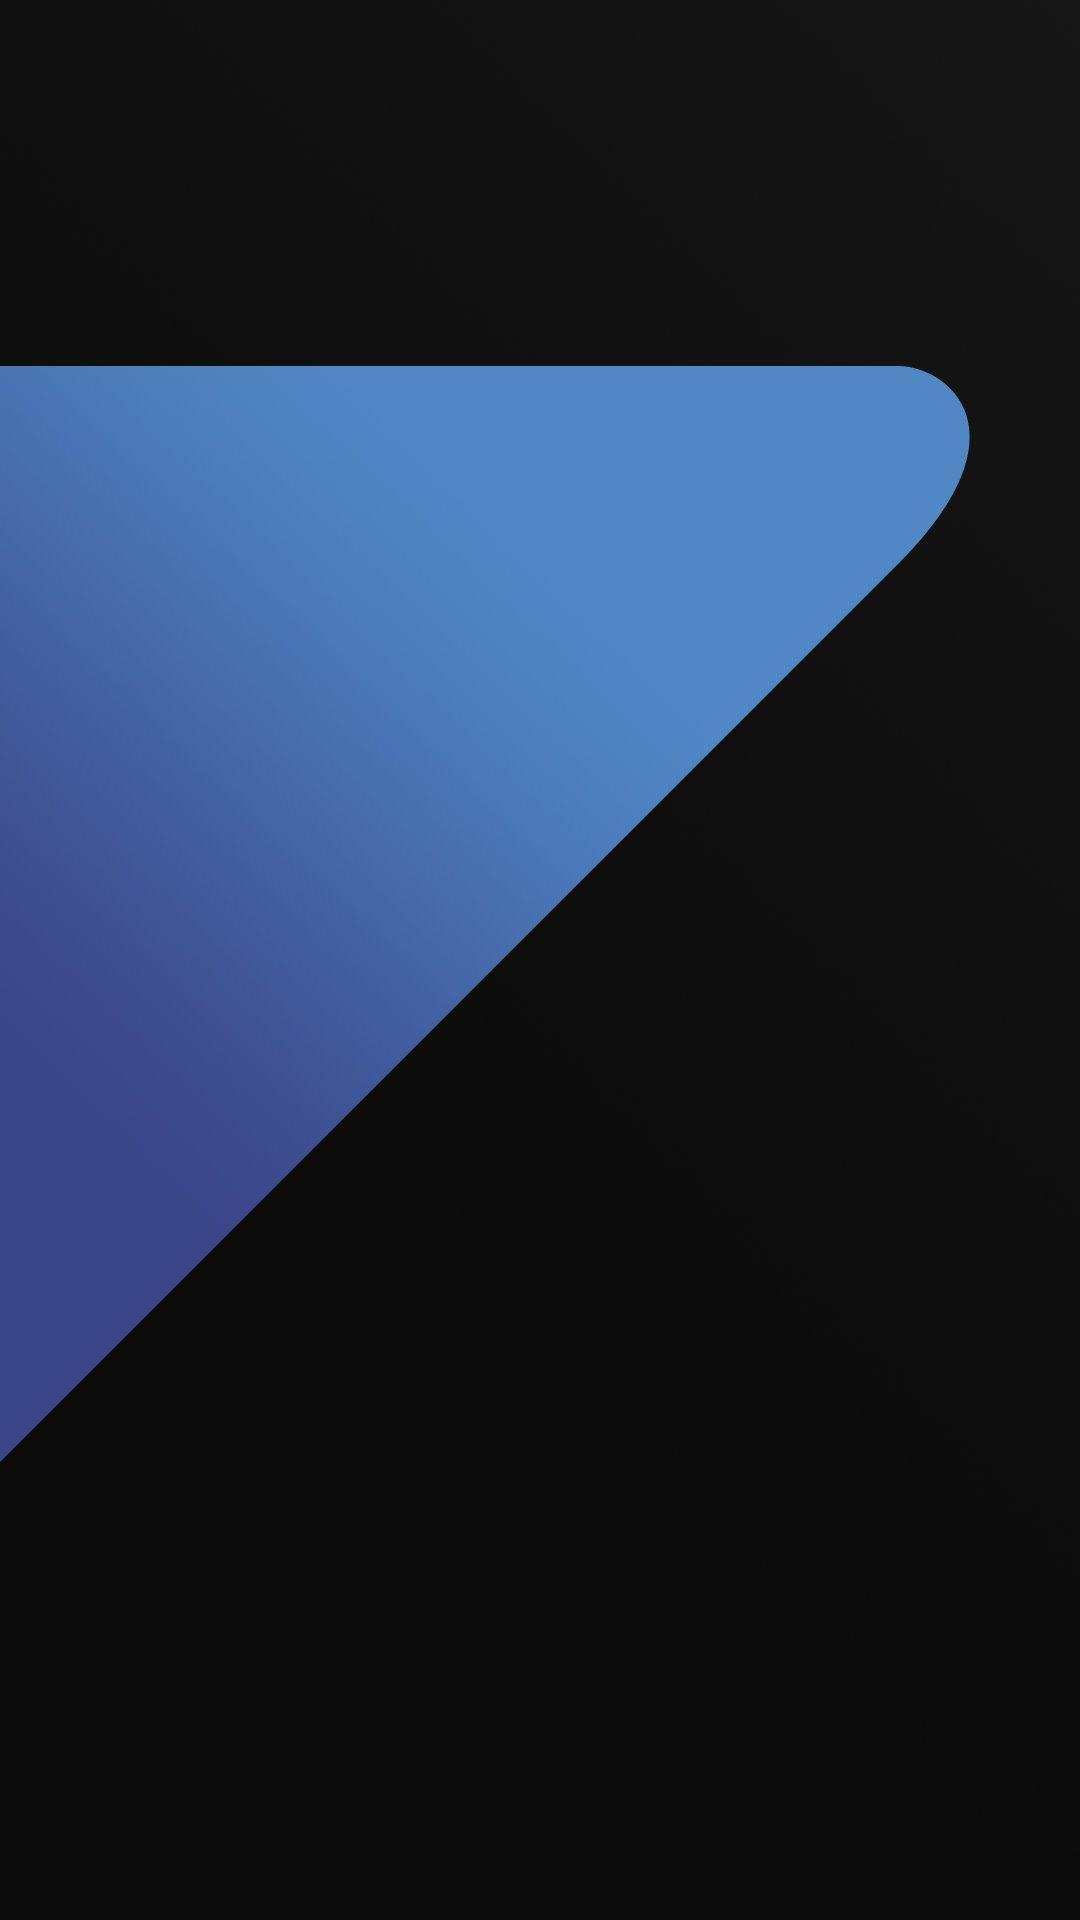 samsung galaxy s7 stock wallpaperszip Device Name Samsung Galaxy S7 1080x1920